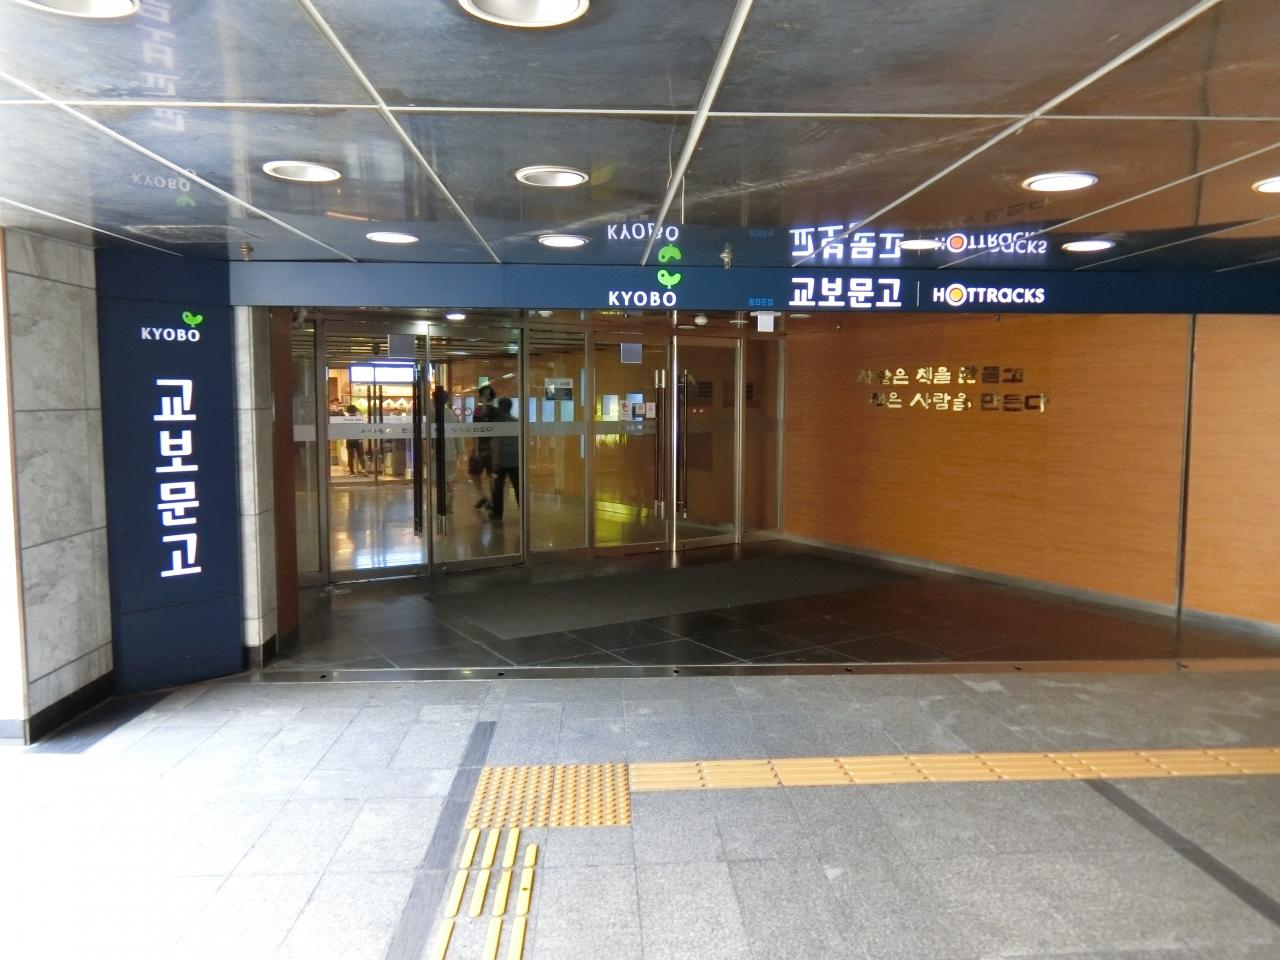 South Korea - Historic Racing League - gmah.org